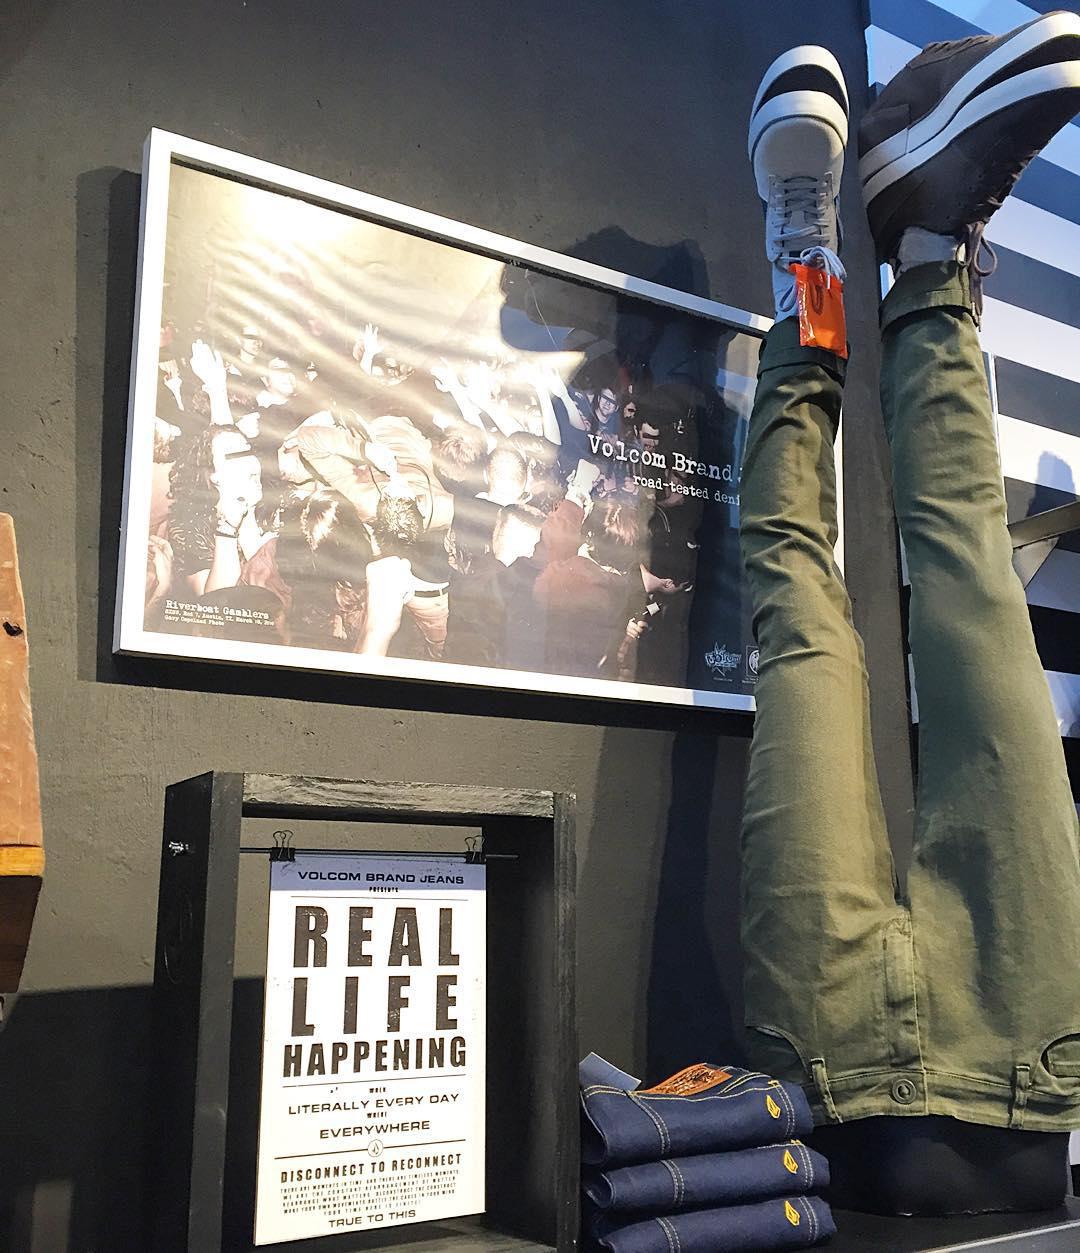 Volcom Brand Jeans, lo nuevo ya en #volcomstores. Tenes el tuyo? #reallifehappening #VBJ #truetothis